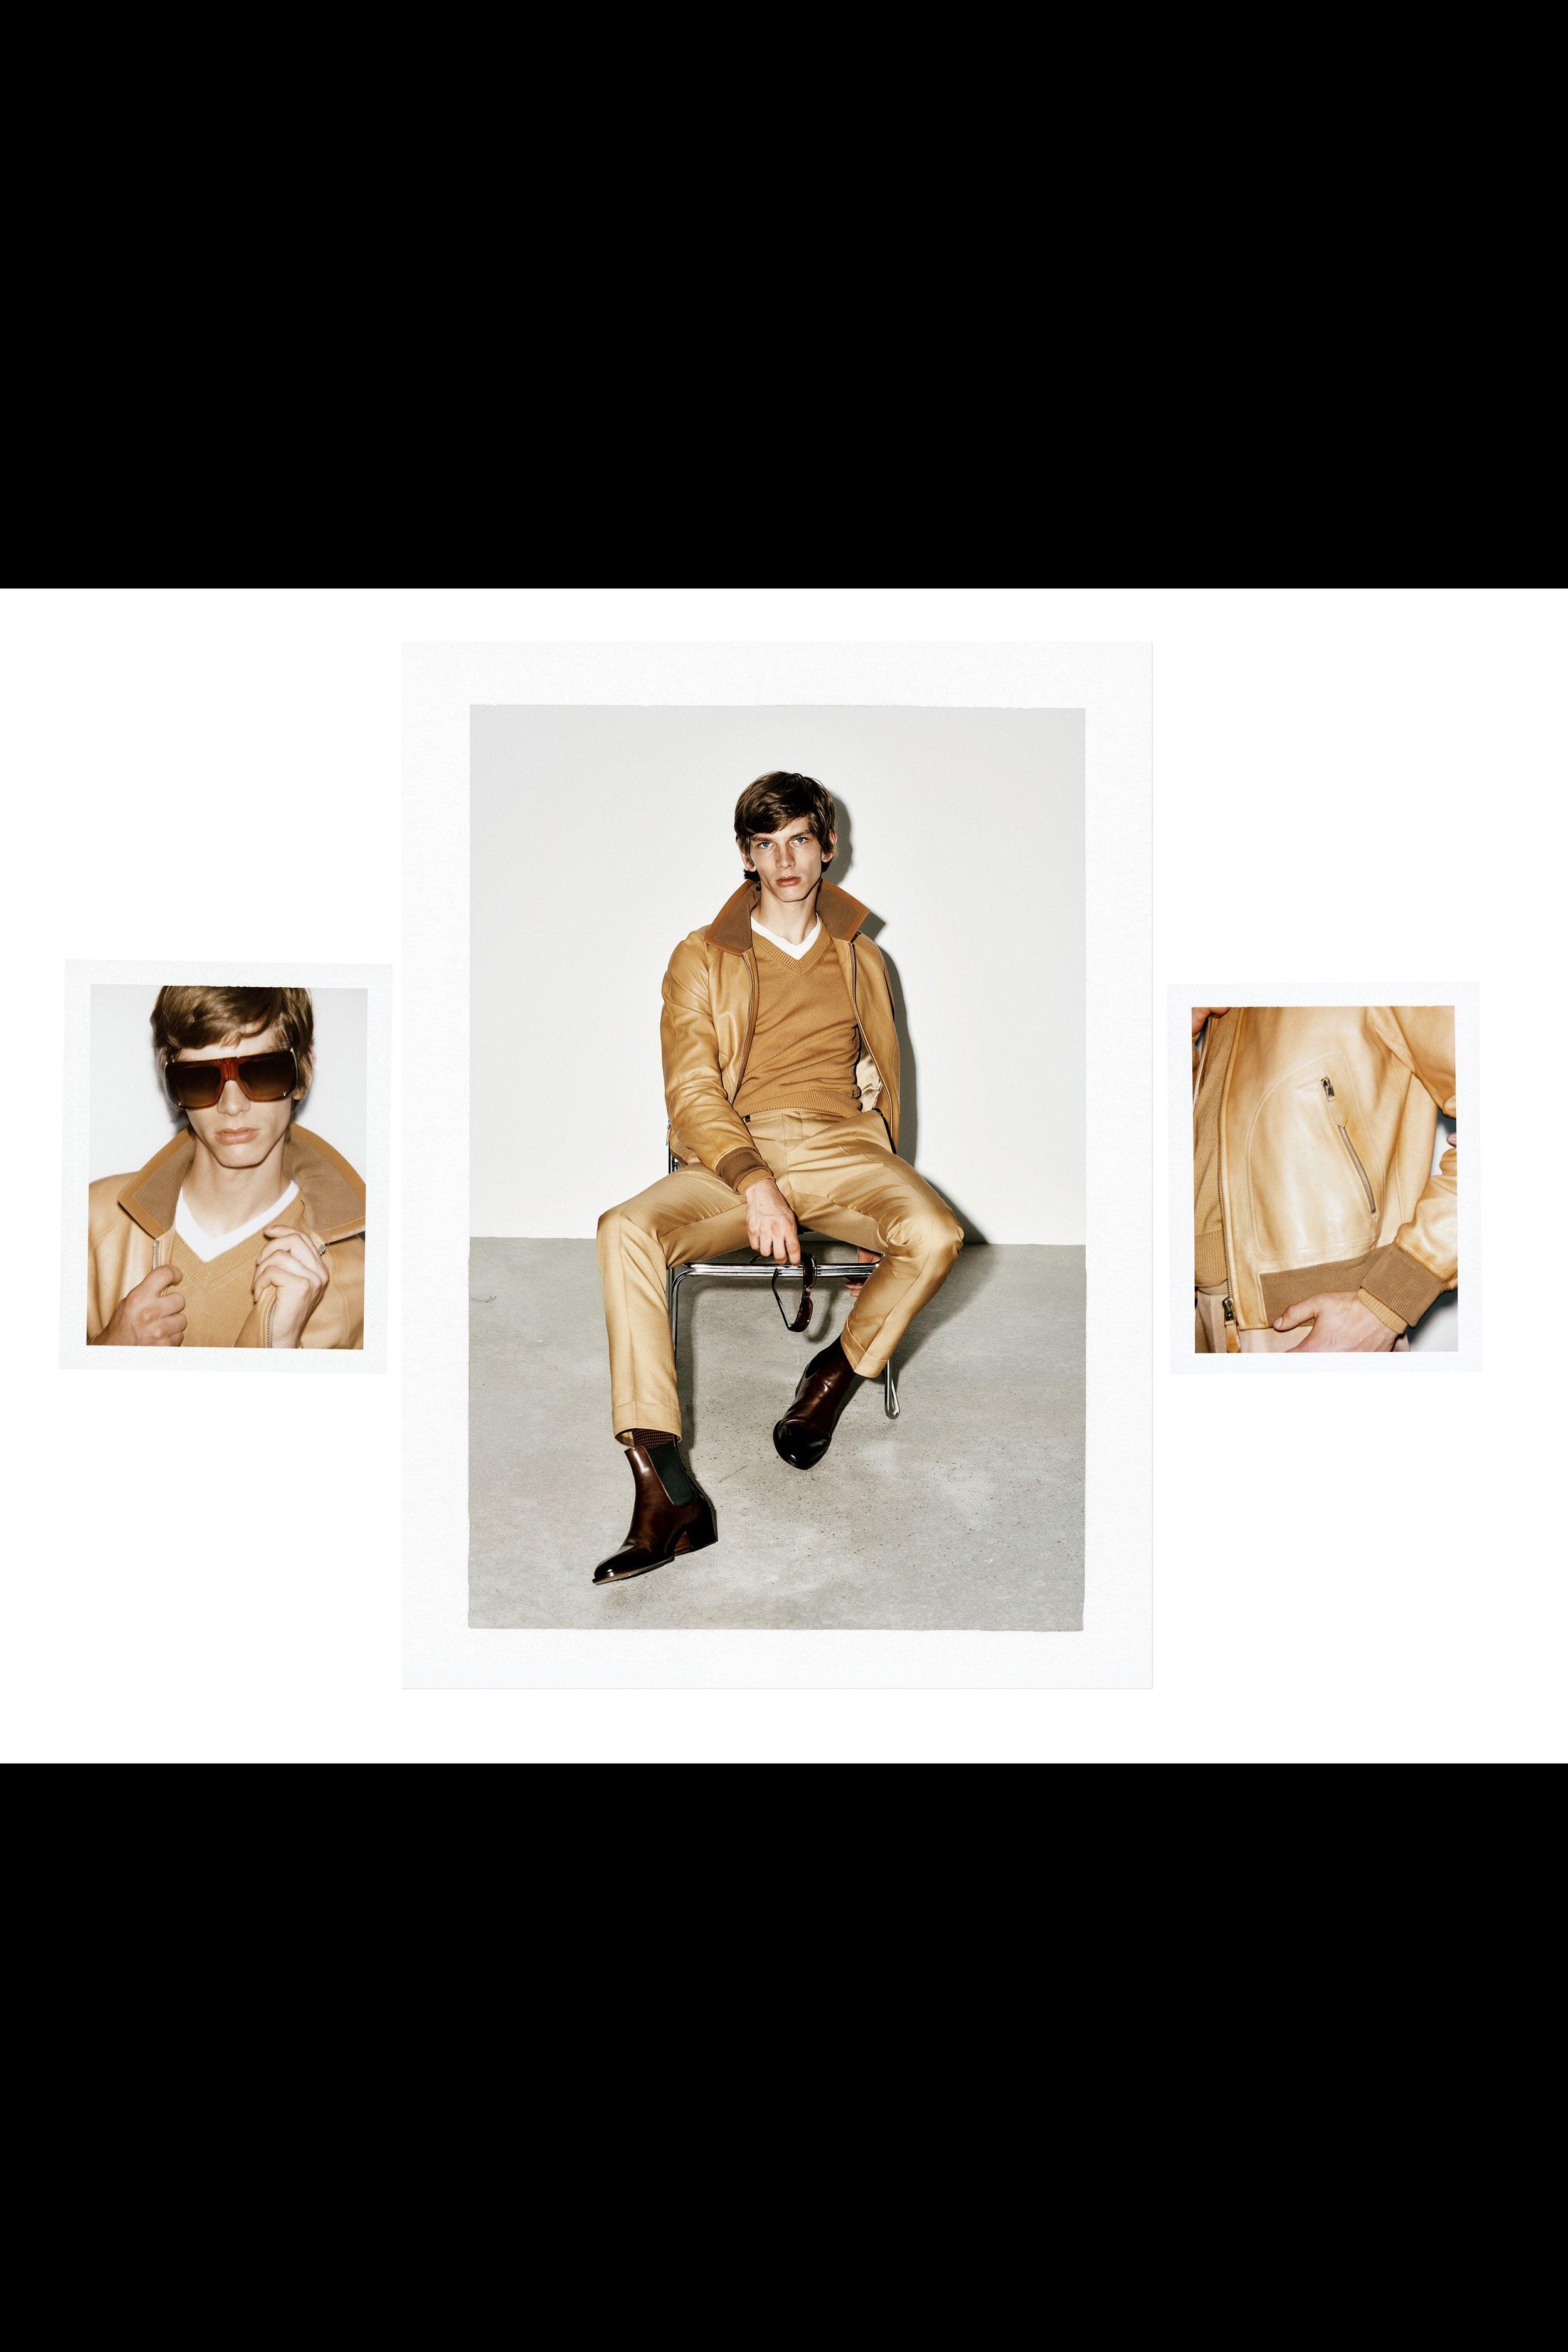 00015-Tom-Ford-vogue-menswear-spring-2019-pr.jpg